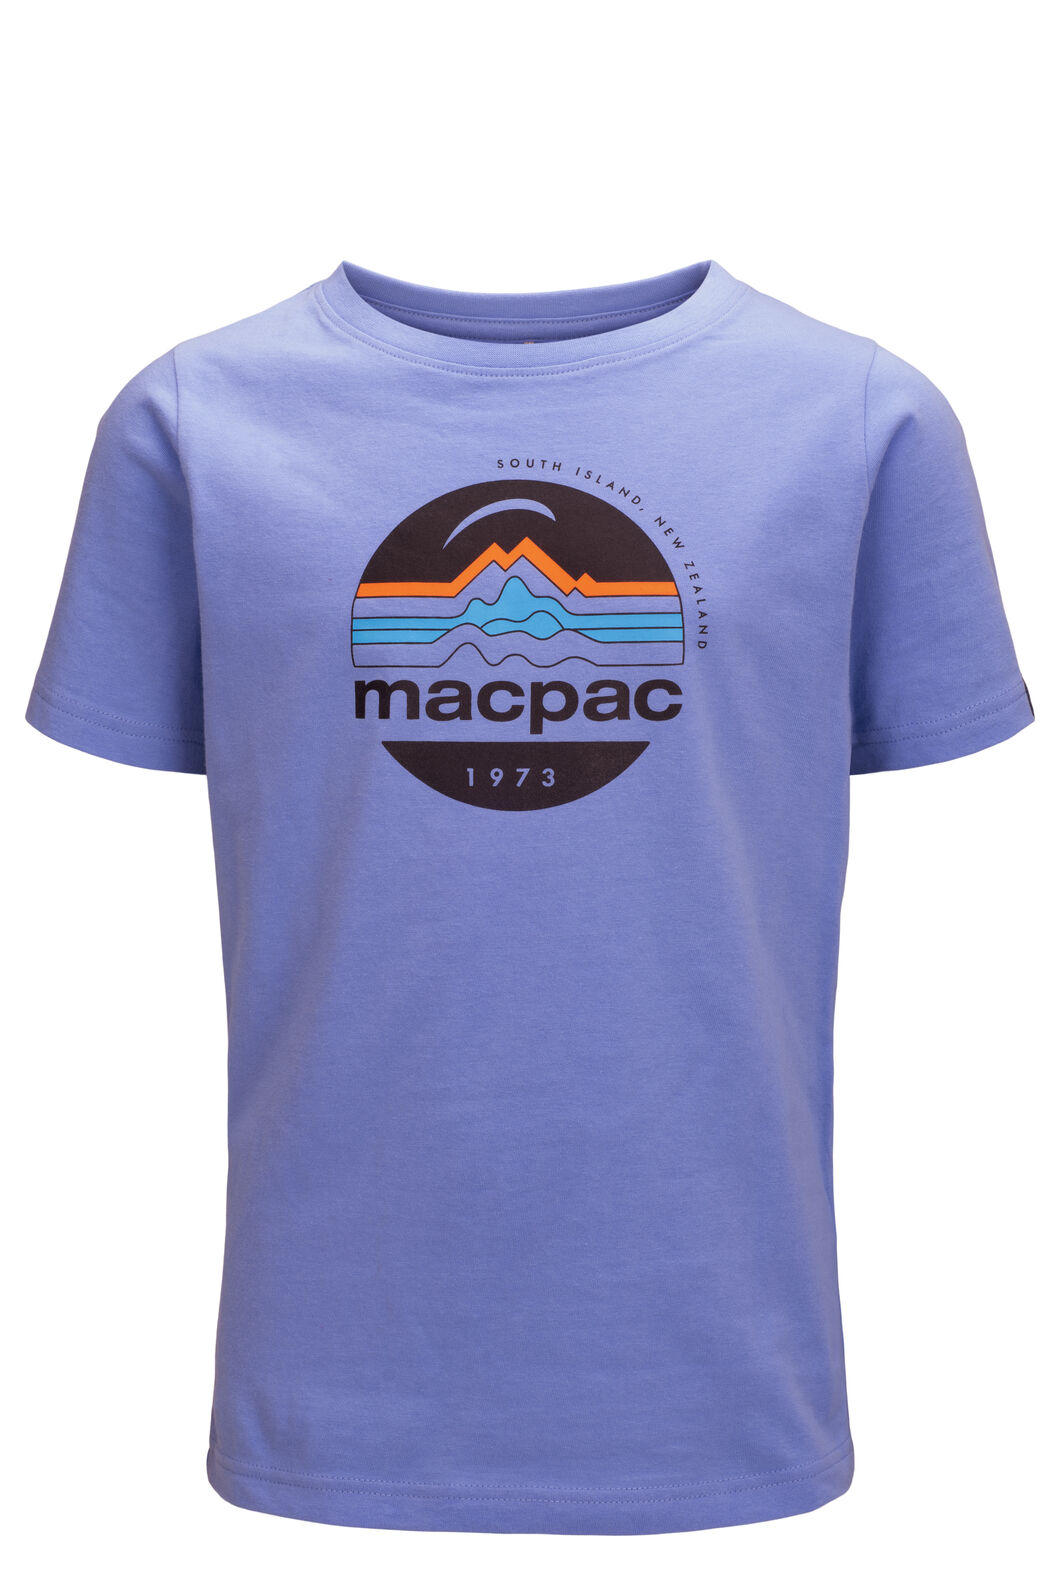 Macpac Kids' Retro Fairtrade Organic Cotton Tee, Cornflower, hi-res